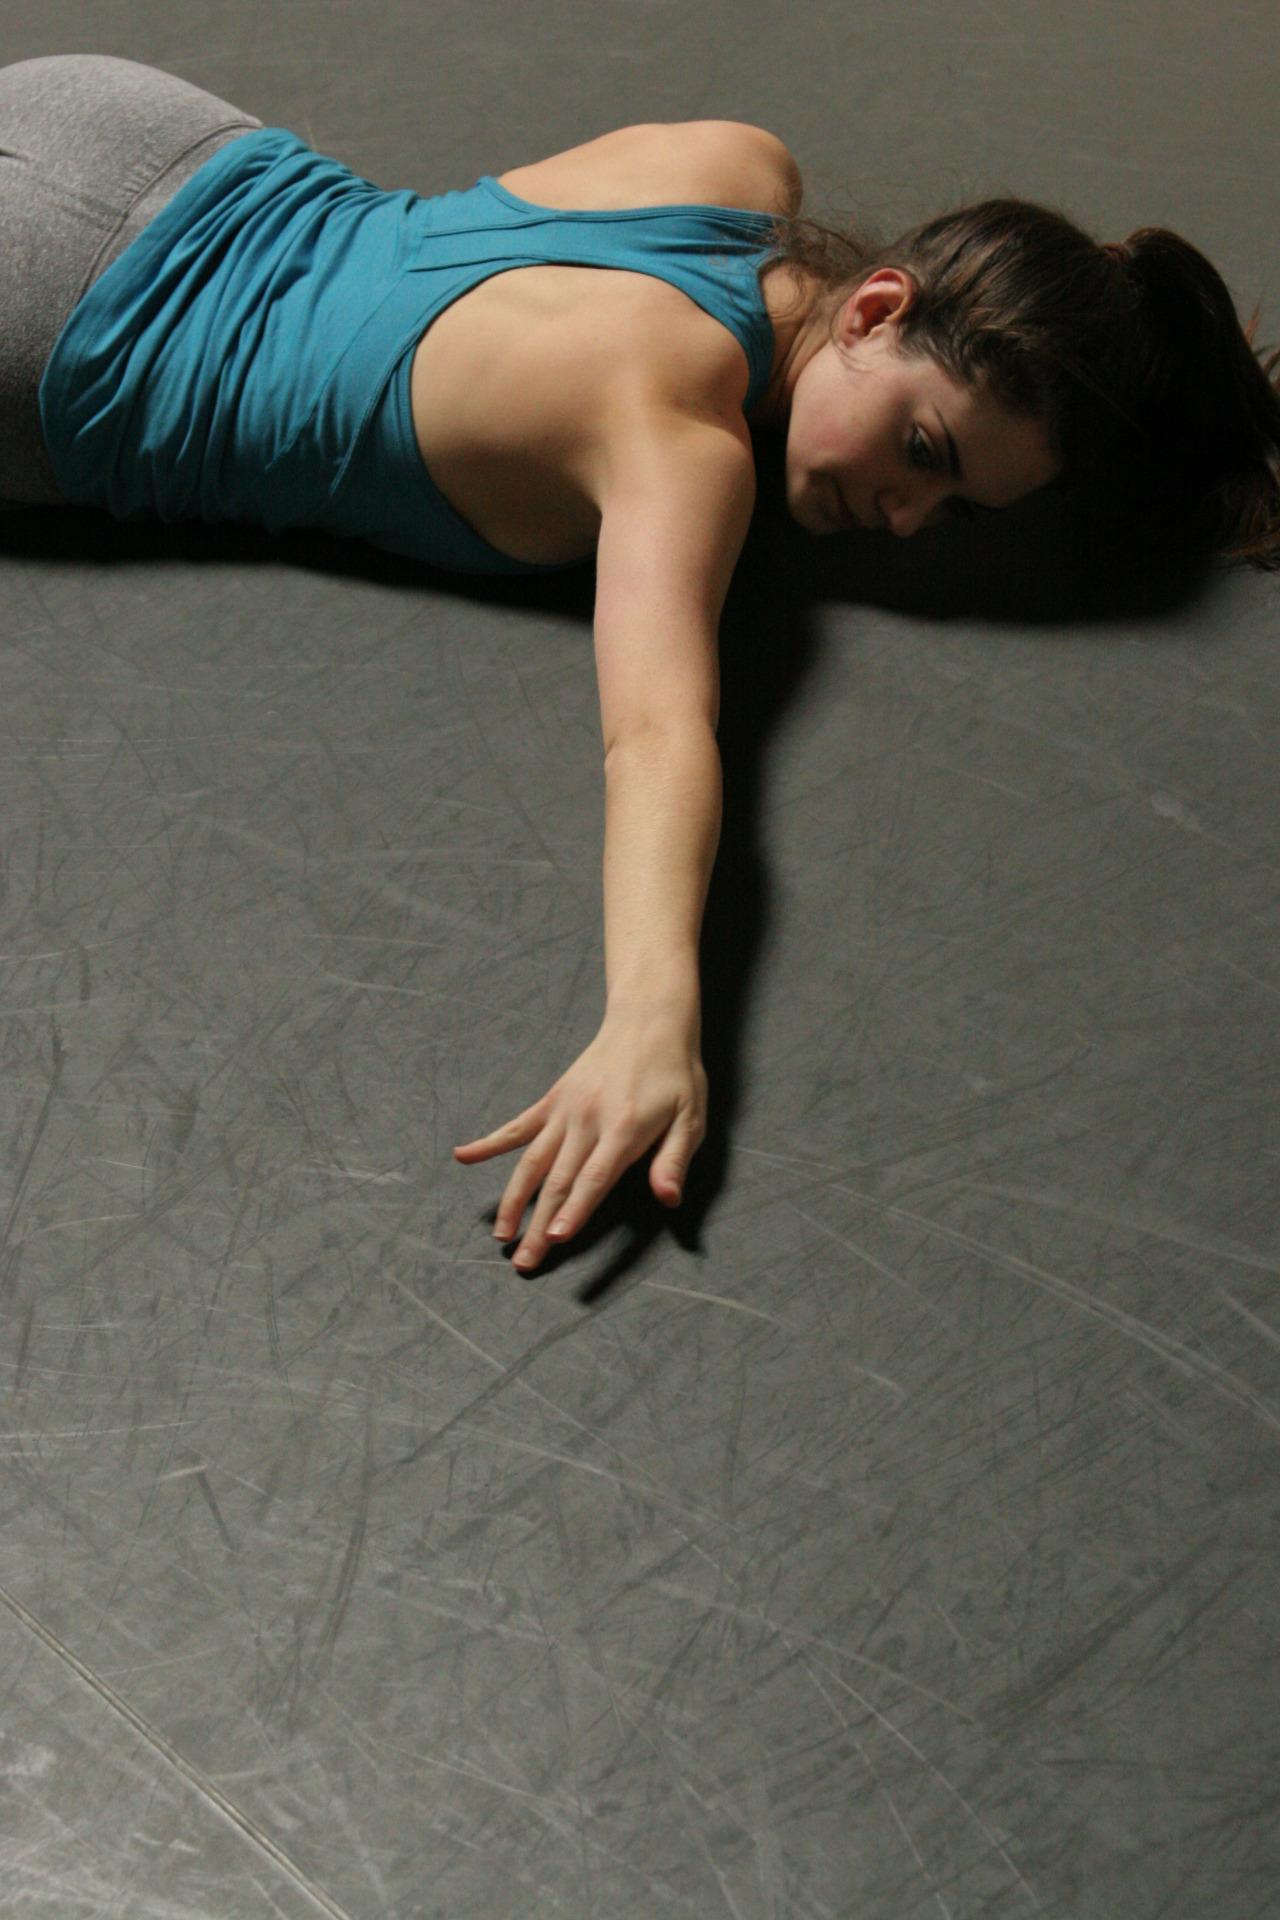 Dancer Emily Bernet rehearsing Joshua L. Peugh's  White Day     WORLD PREMIERE MAR 13-15    GET TICKETS:  http://www.darkcirclescontemporarydance.com/